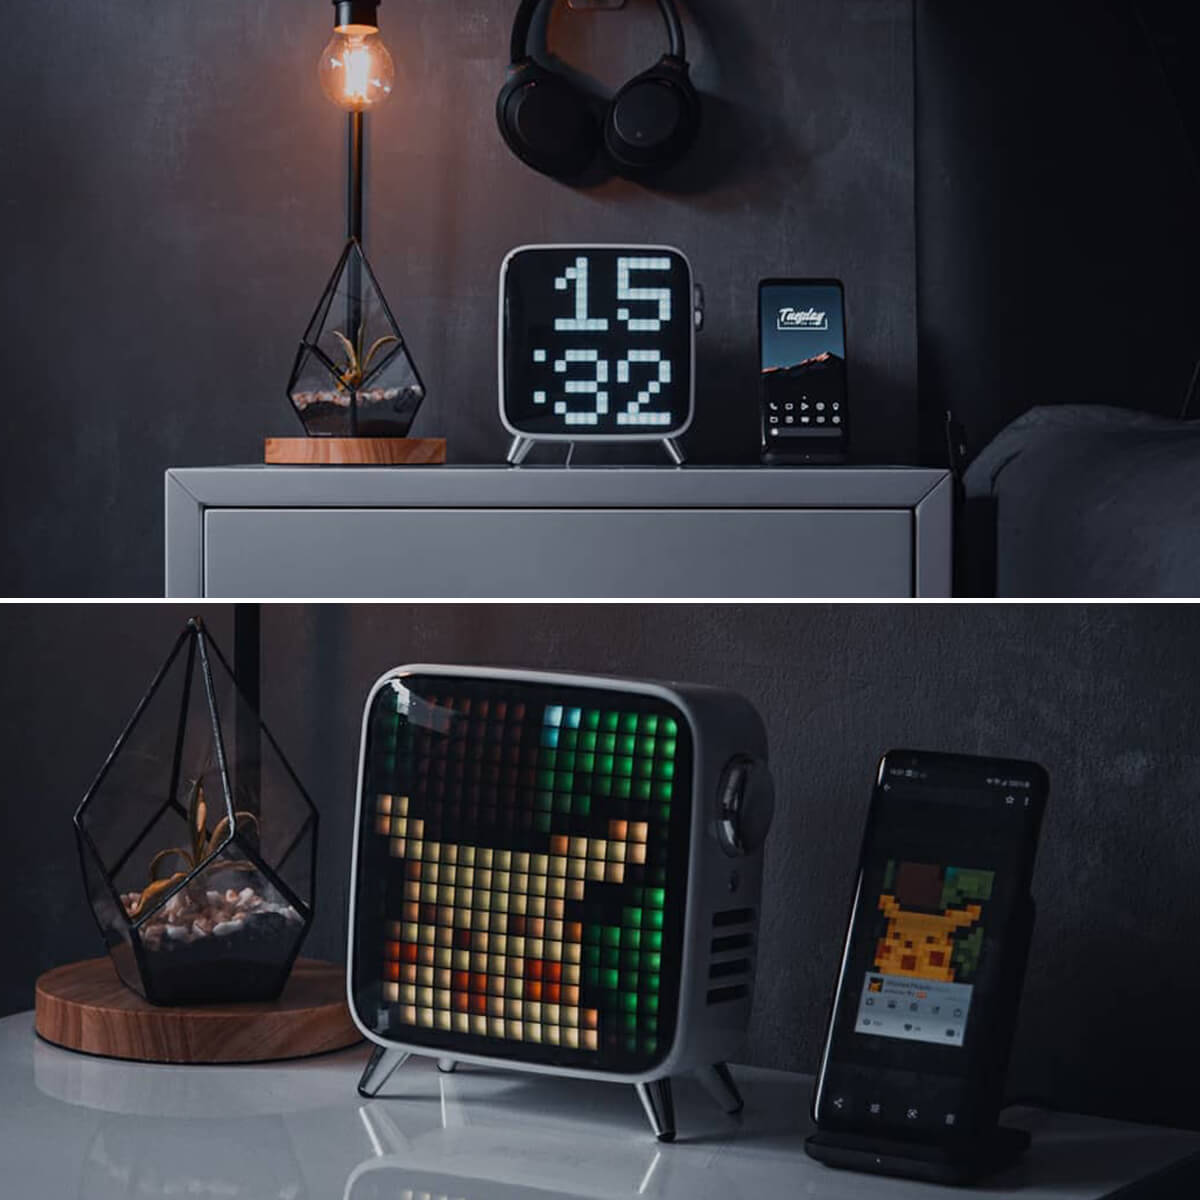 Pixel Art LED Tabletop Clock